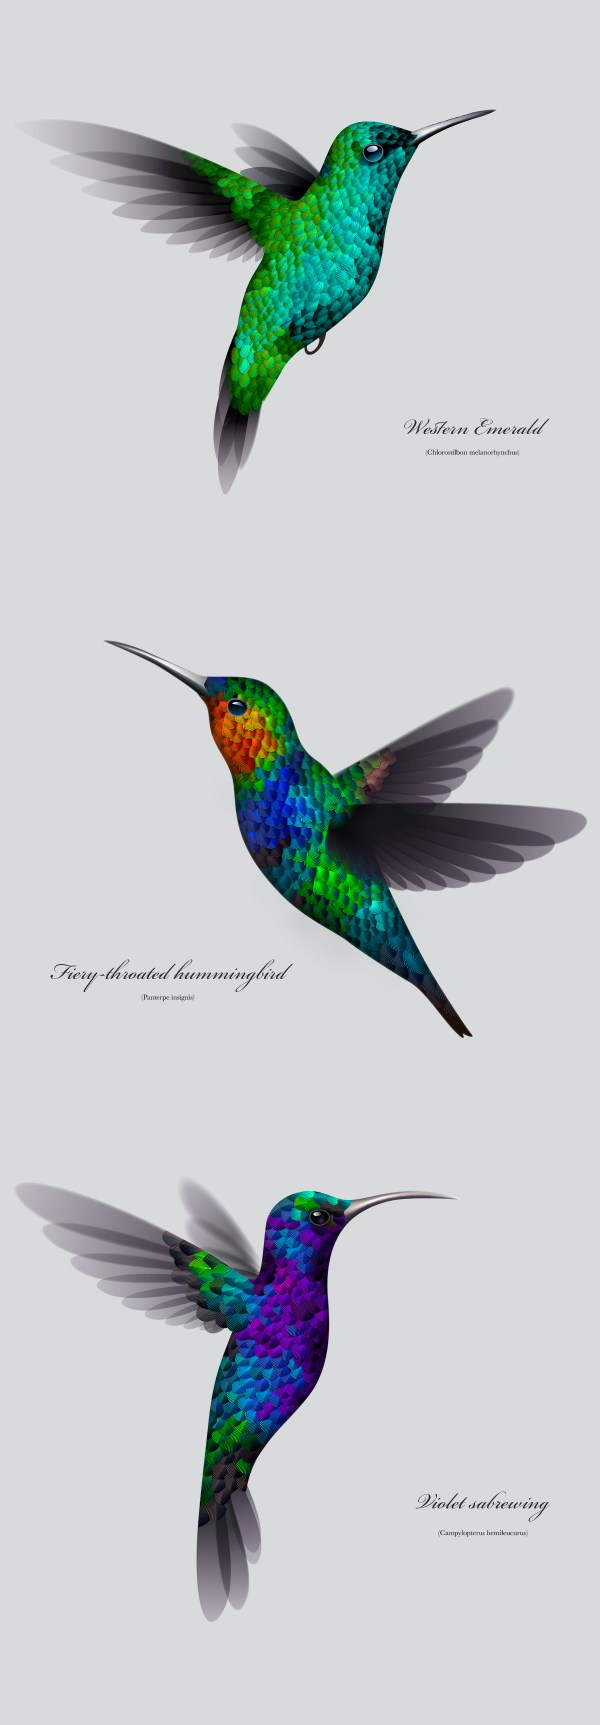 Illustrator Experiment Making Hummingbird Create